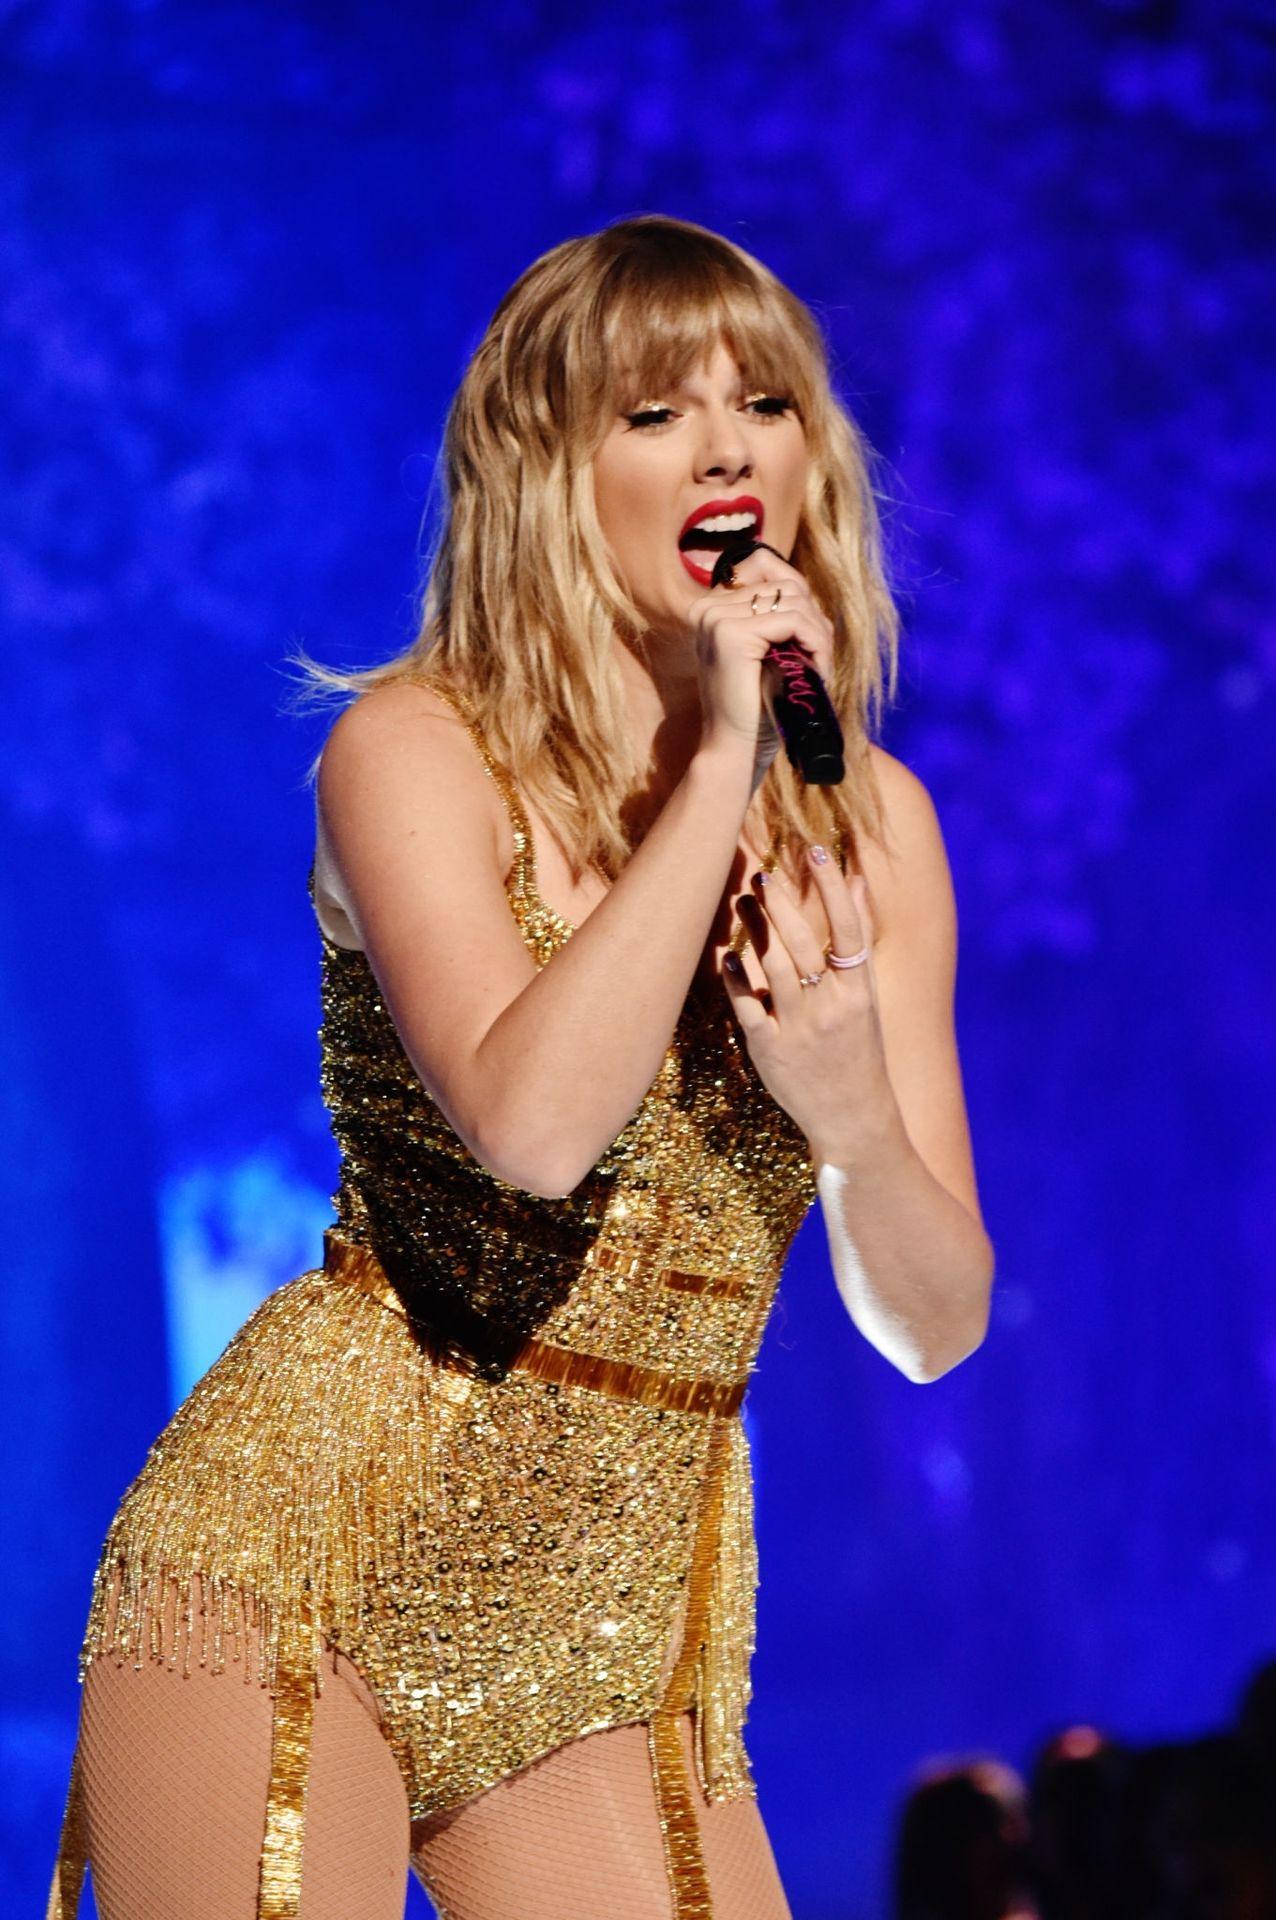 Taylor Swift Sexy 0112